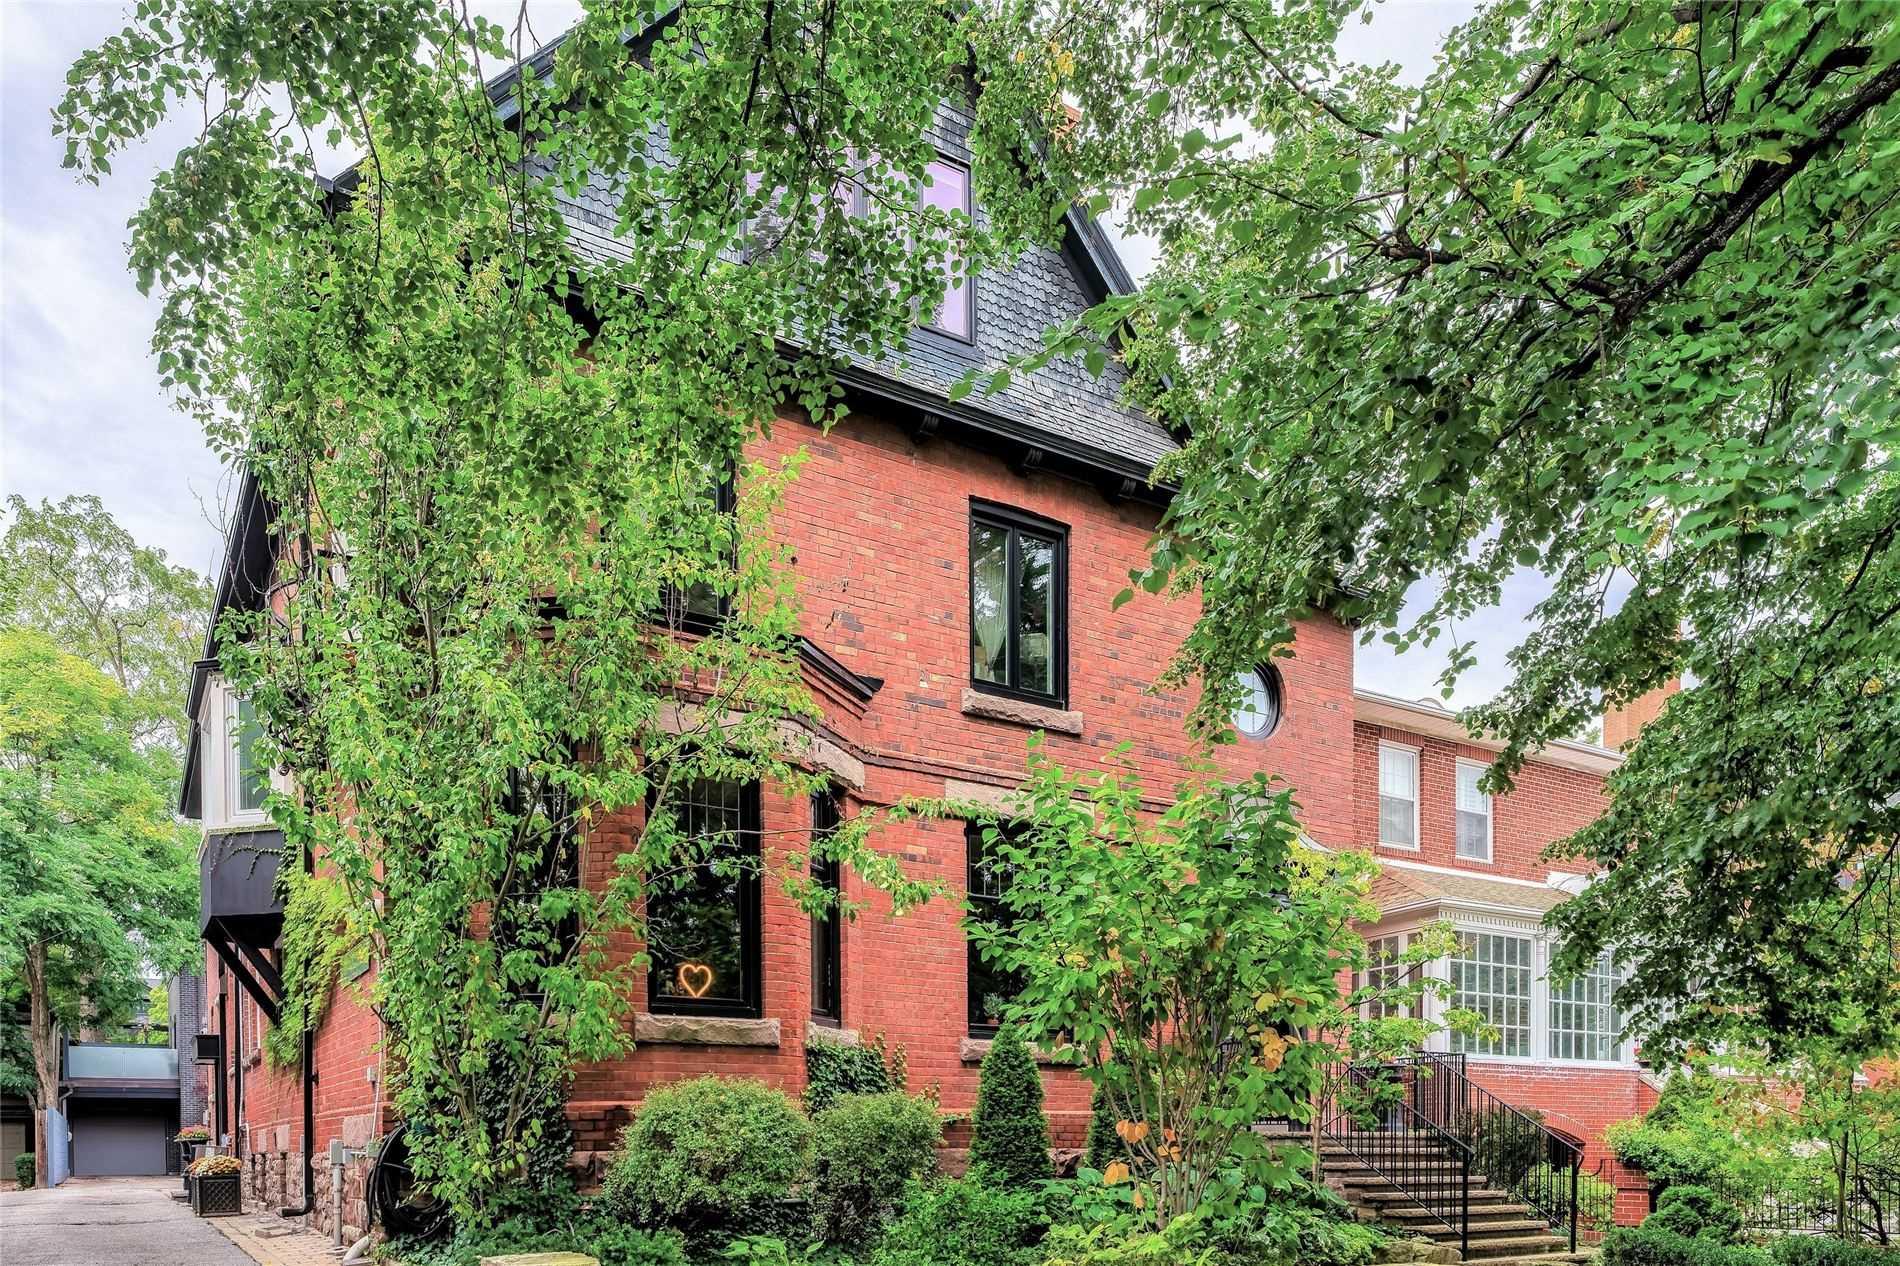 300 - 80 Crescent Rd, Toronto, M4W1T5